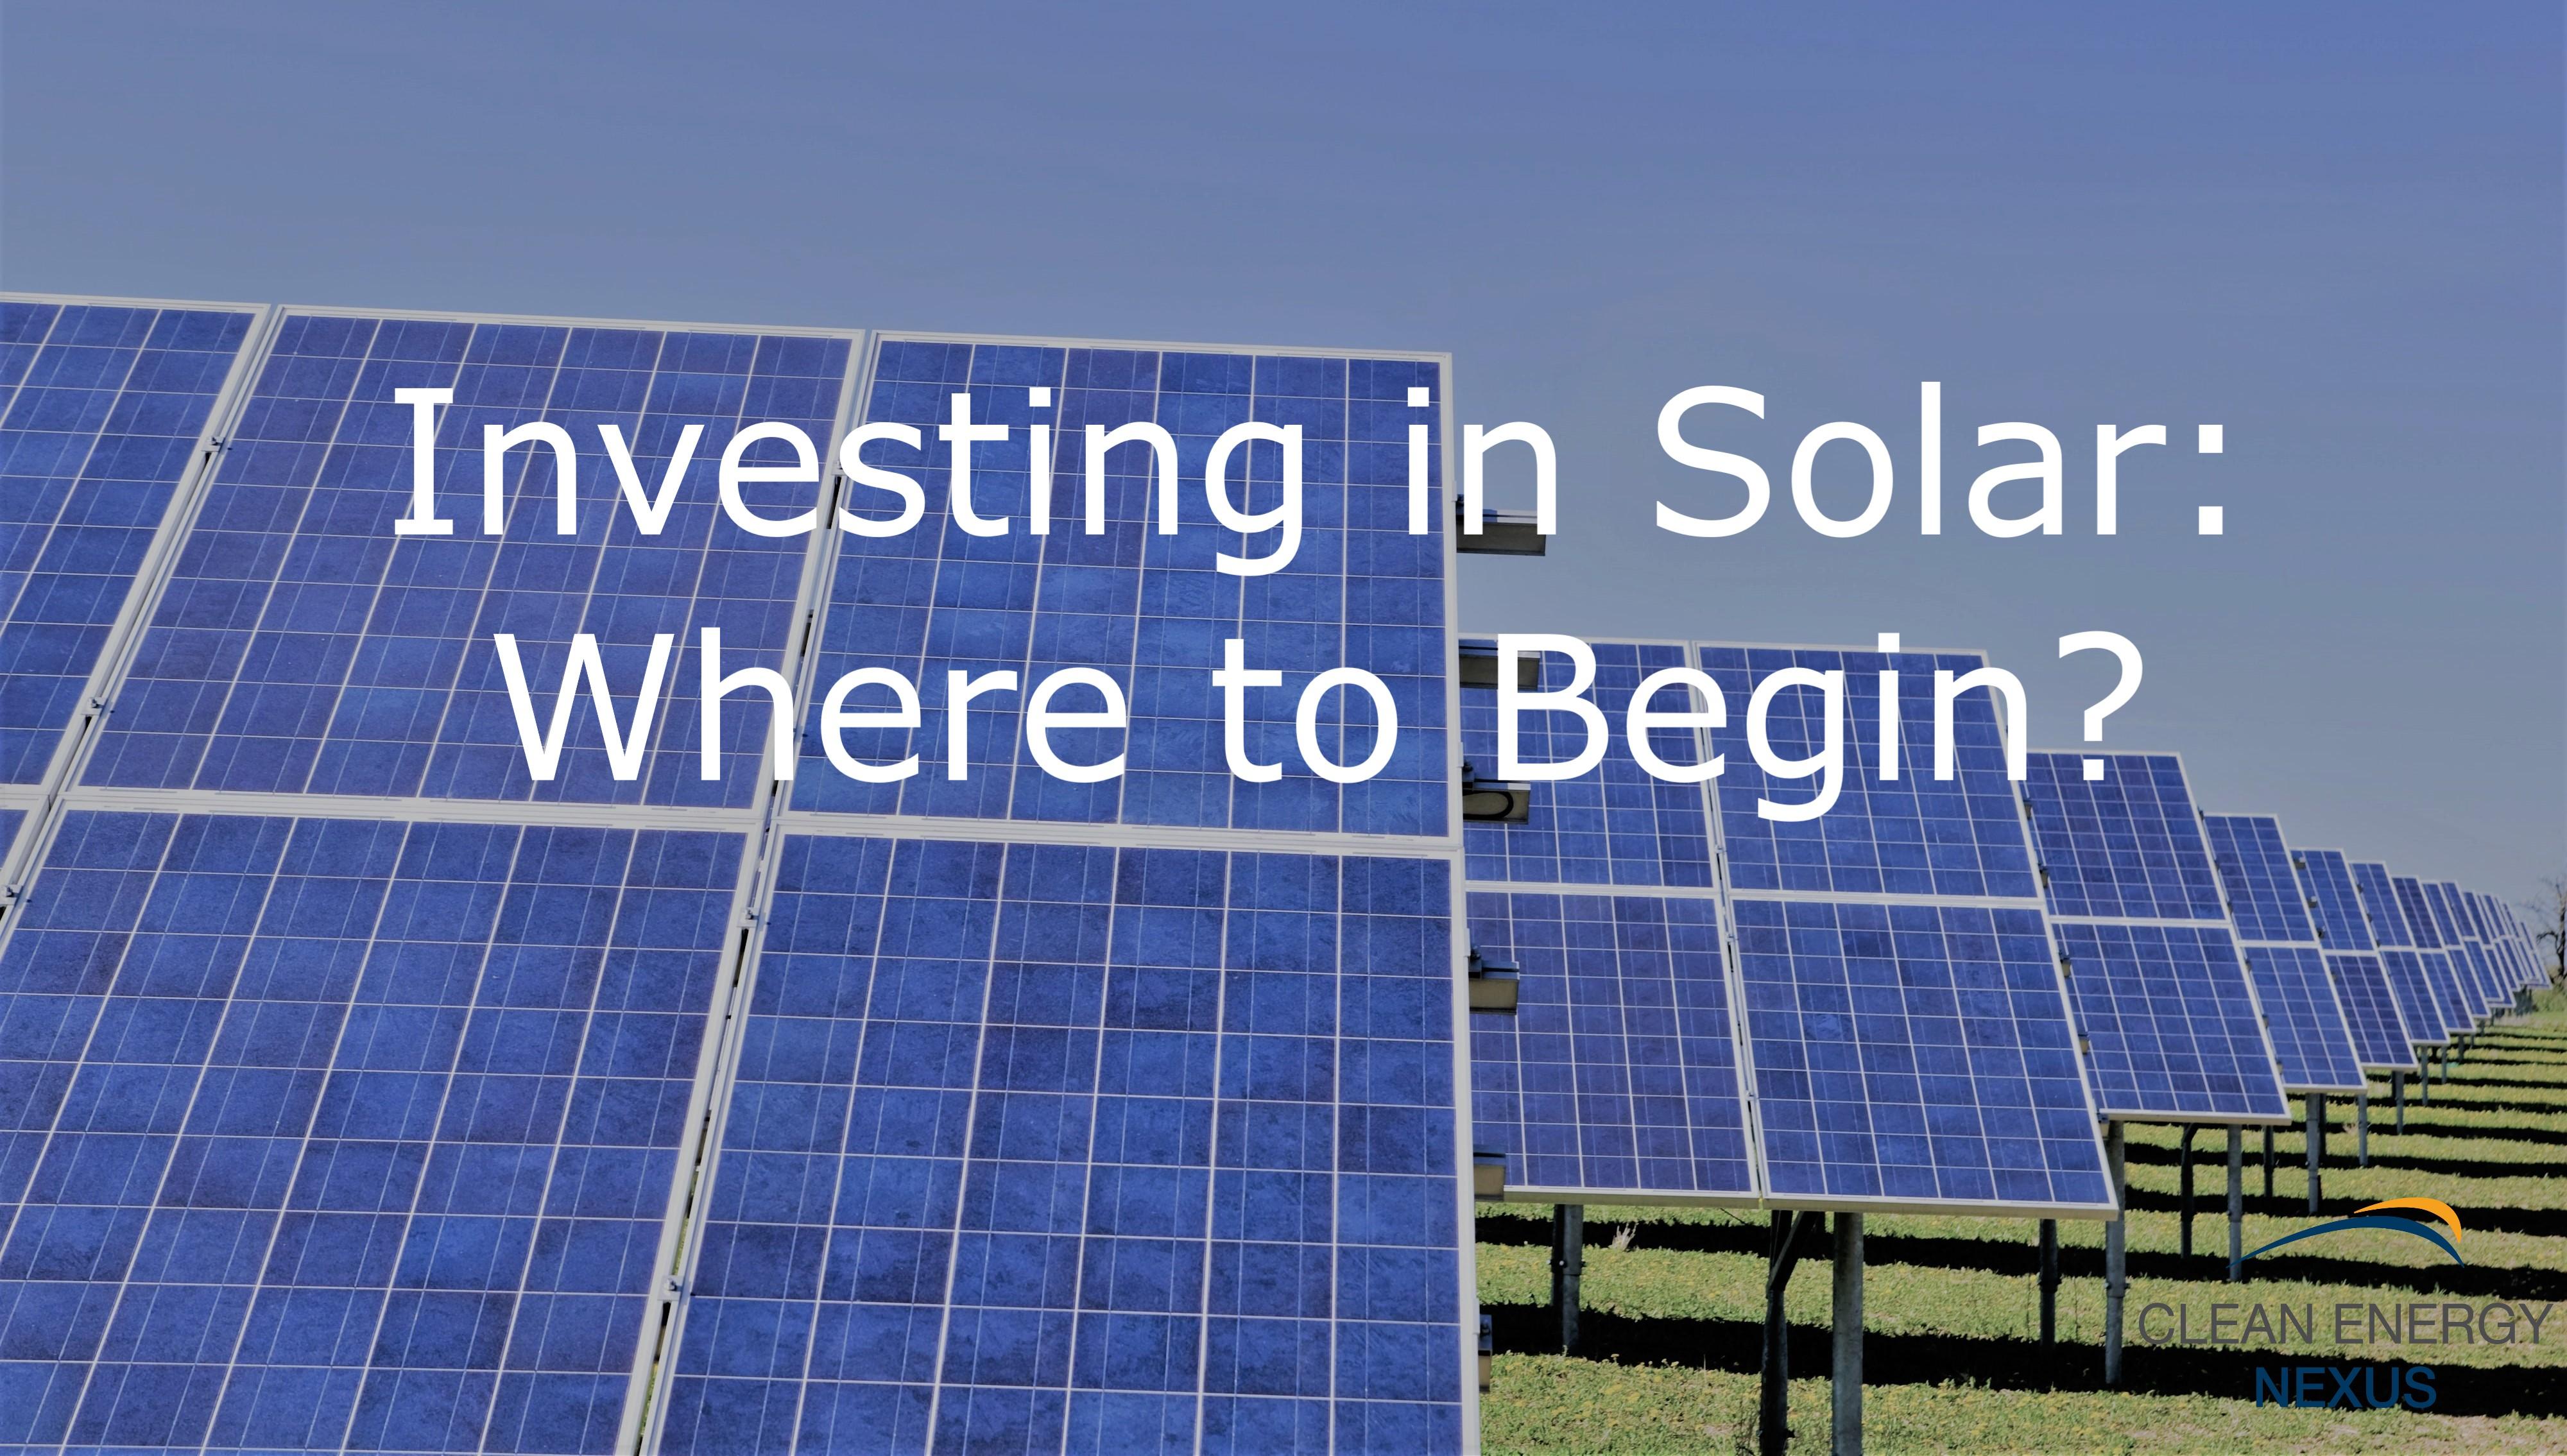 Investing in Solar Where to Begin